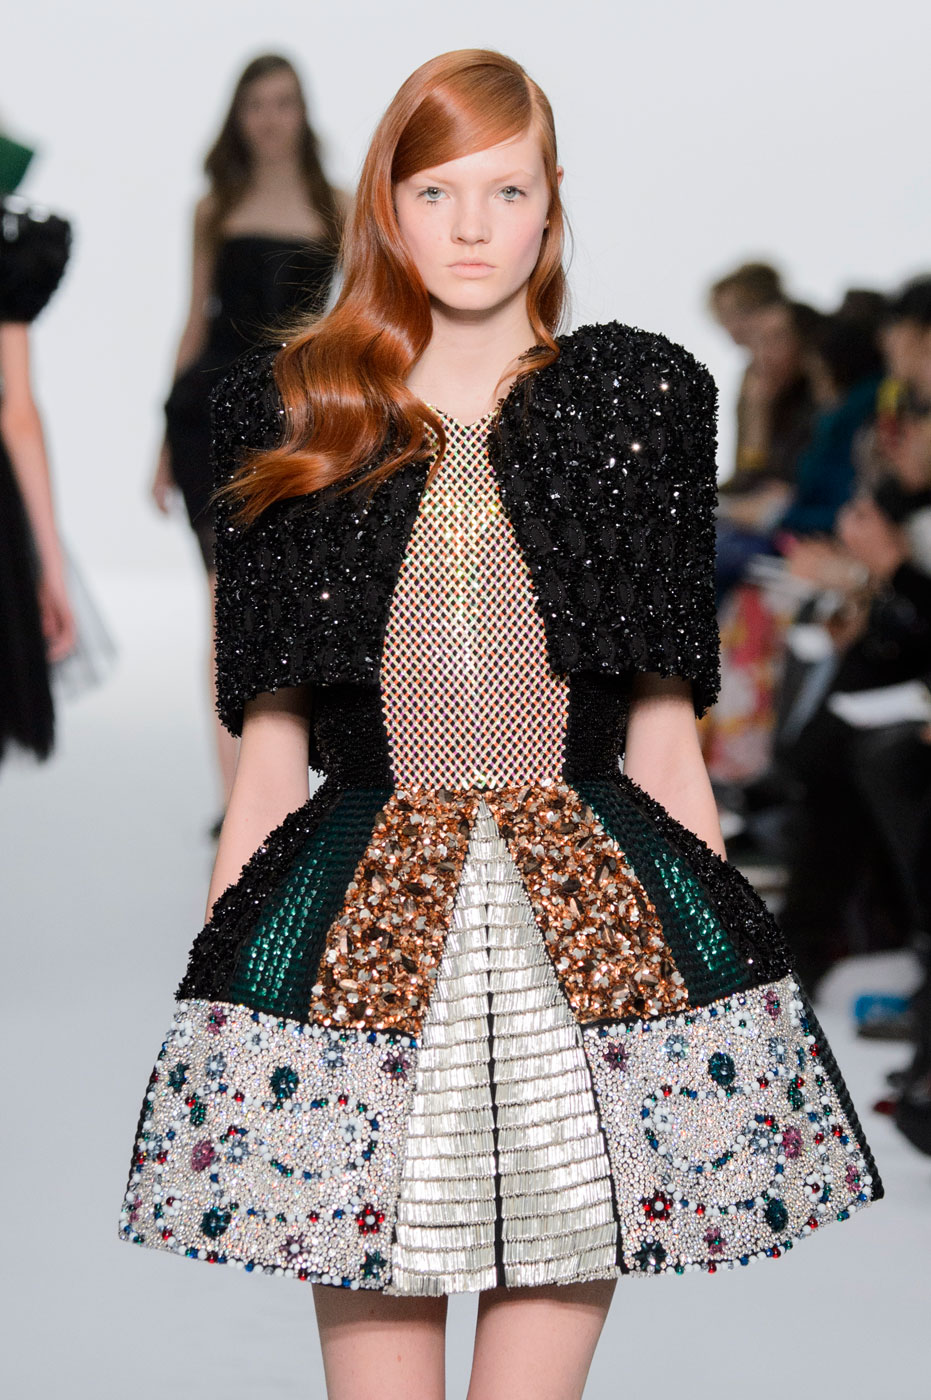 Kayek-fashion-runway-show-haute-couture-paris-spring-summer-2015-the-impression-36